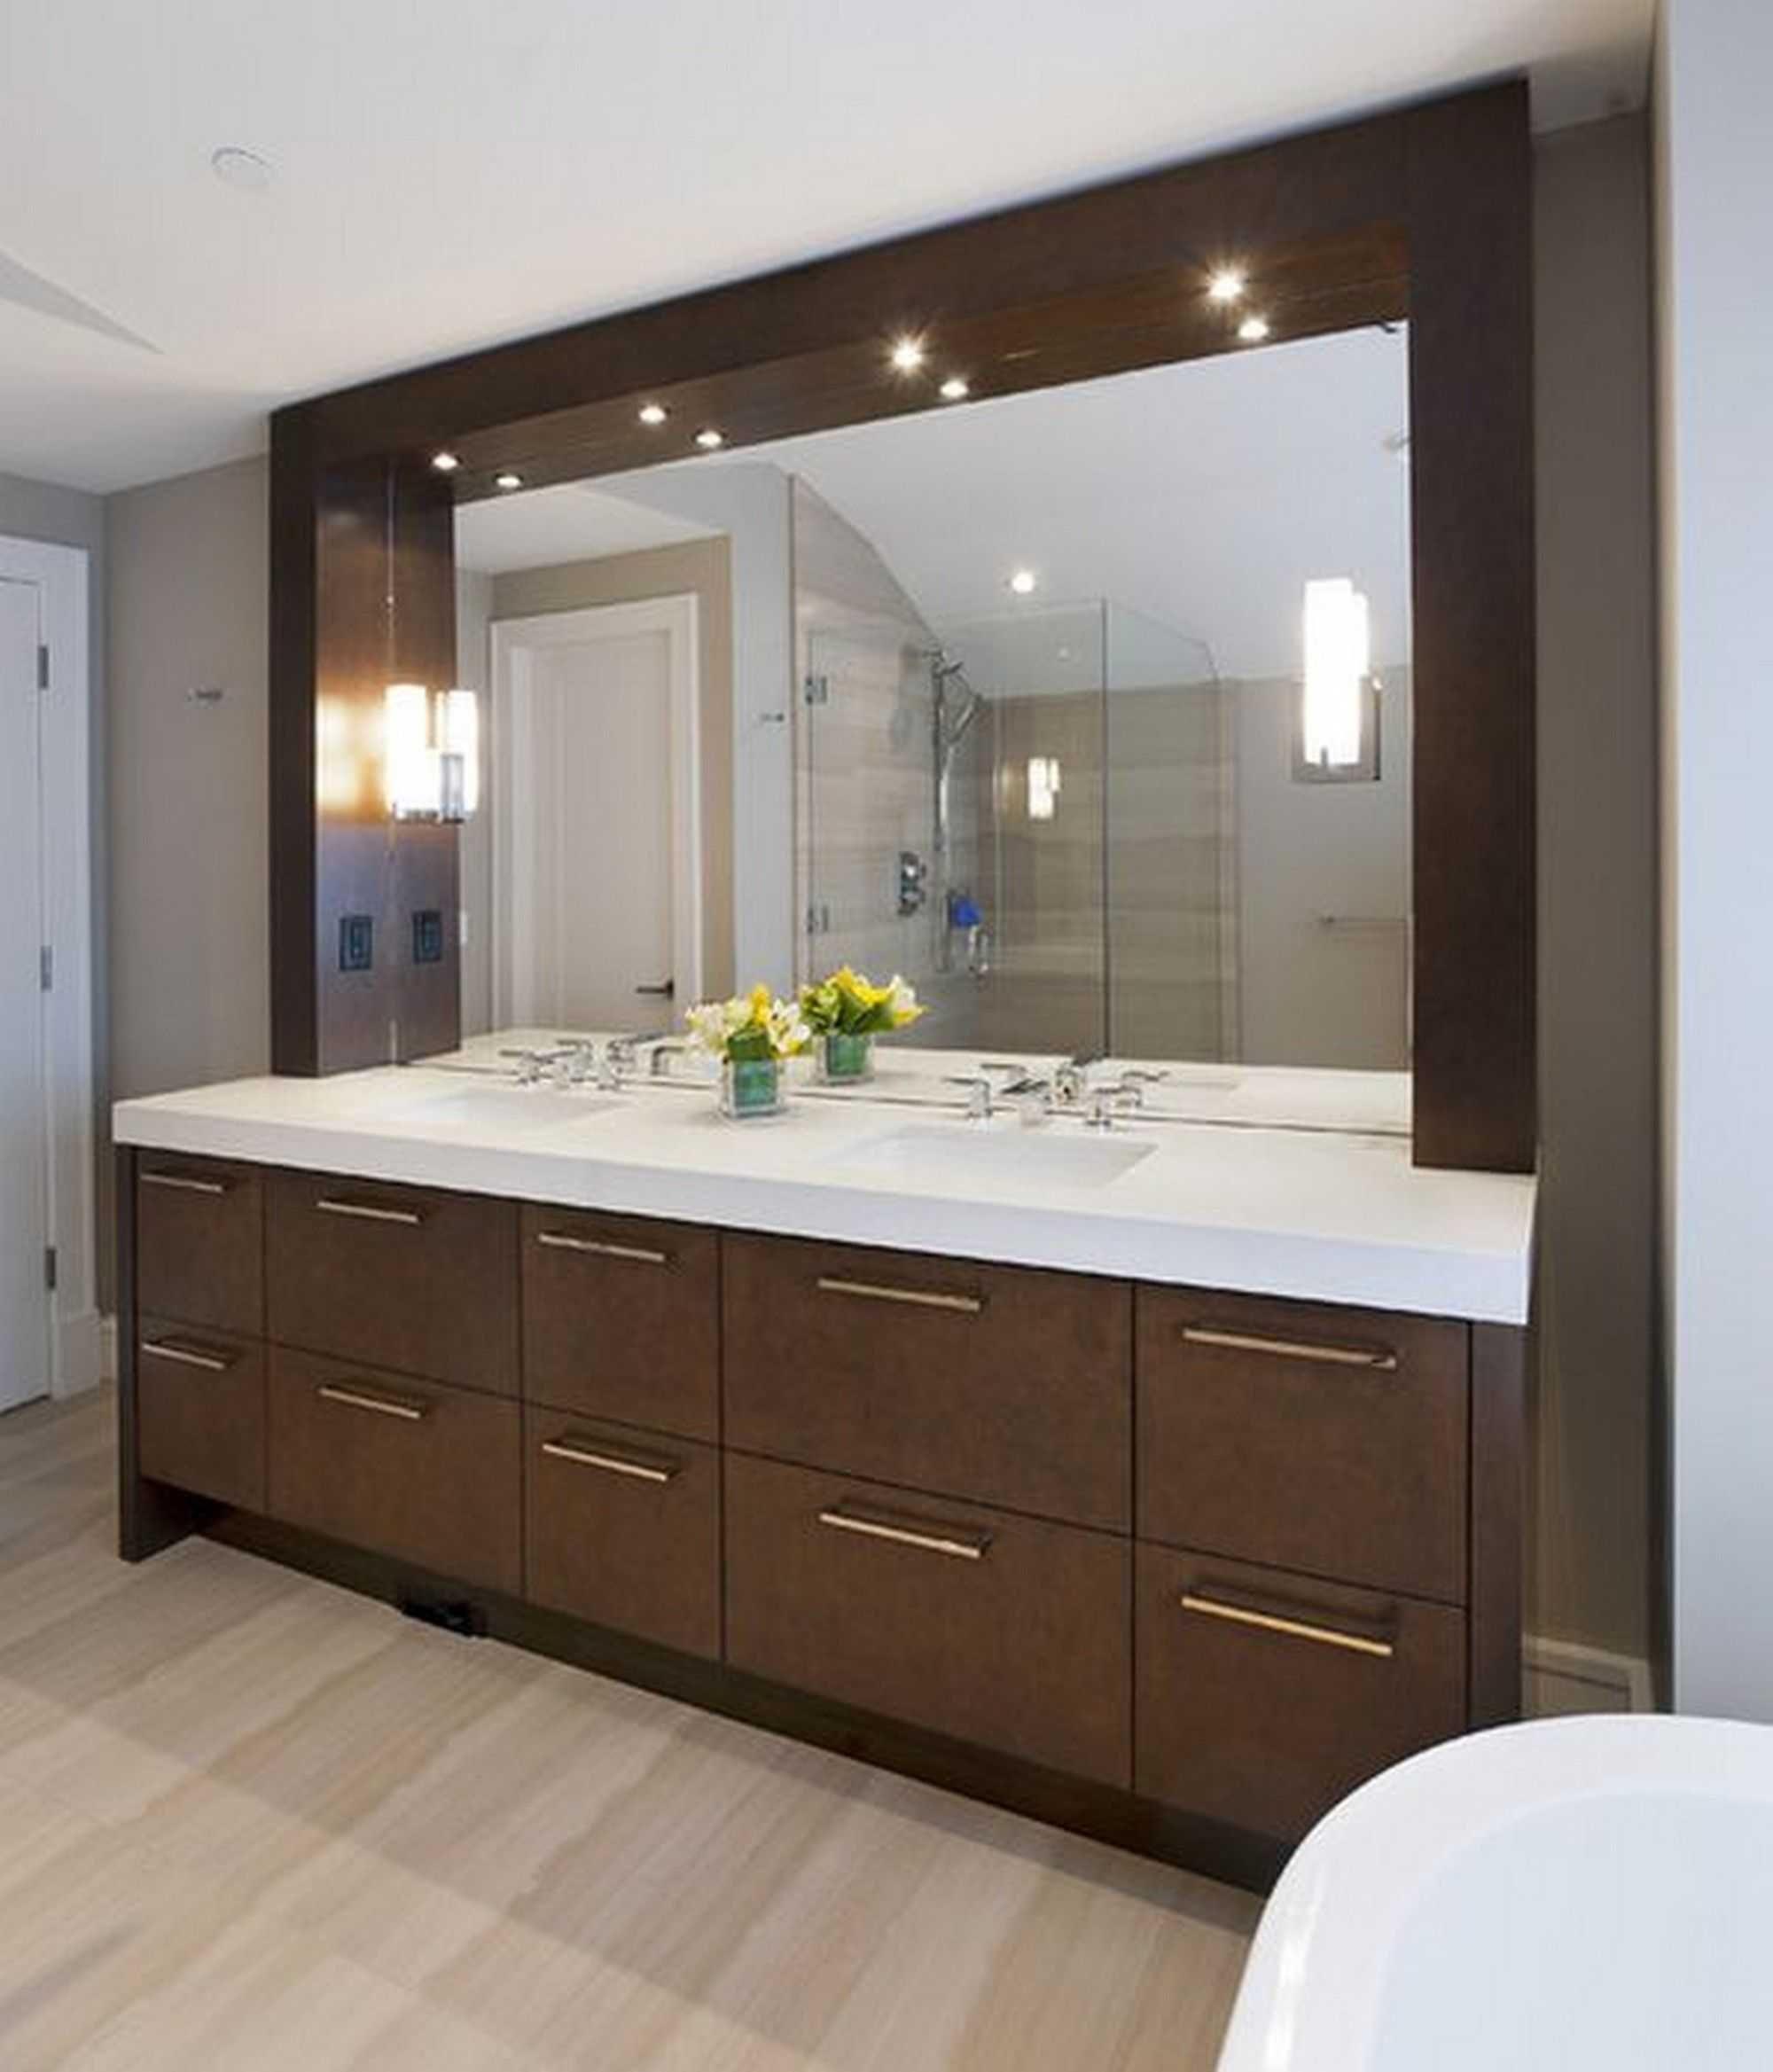 24 Luxury Vanity Mirror With Lights Ideas Manlikemarvinsparks Com Modern Bathroom Vanity Lighting Floating Bathroom Vanities Light Fixtures Bathroom Vanity